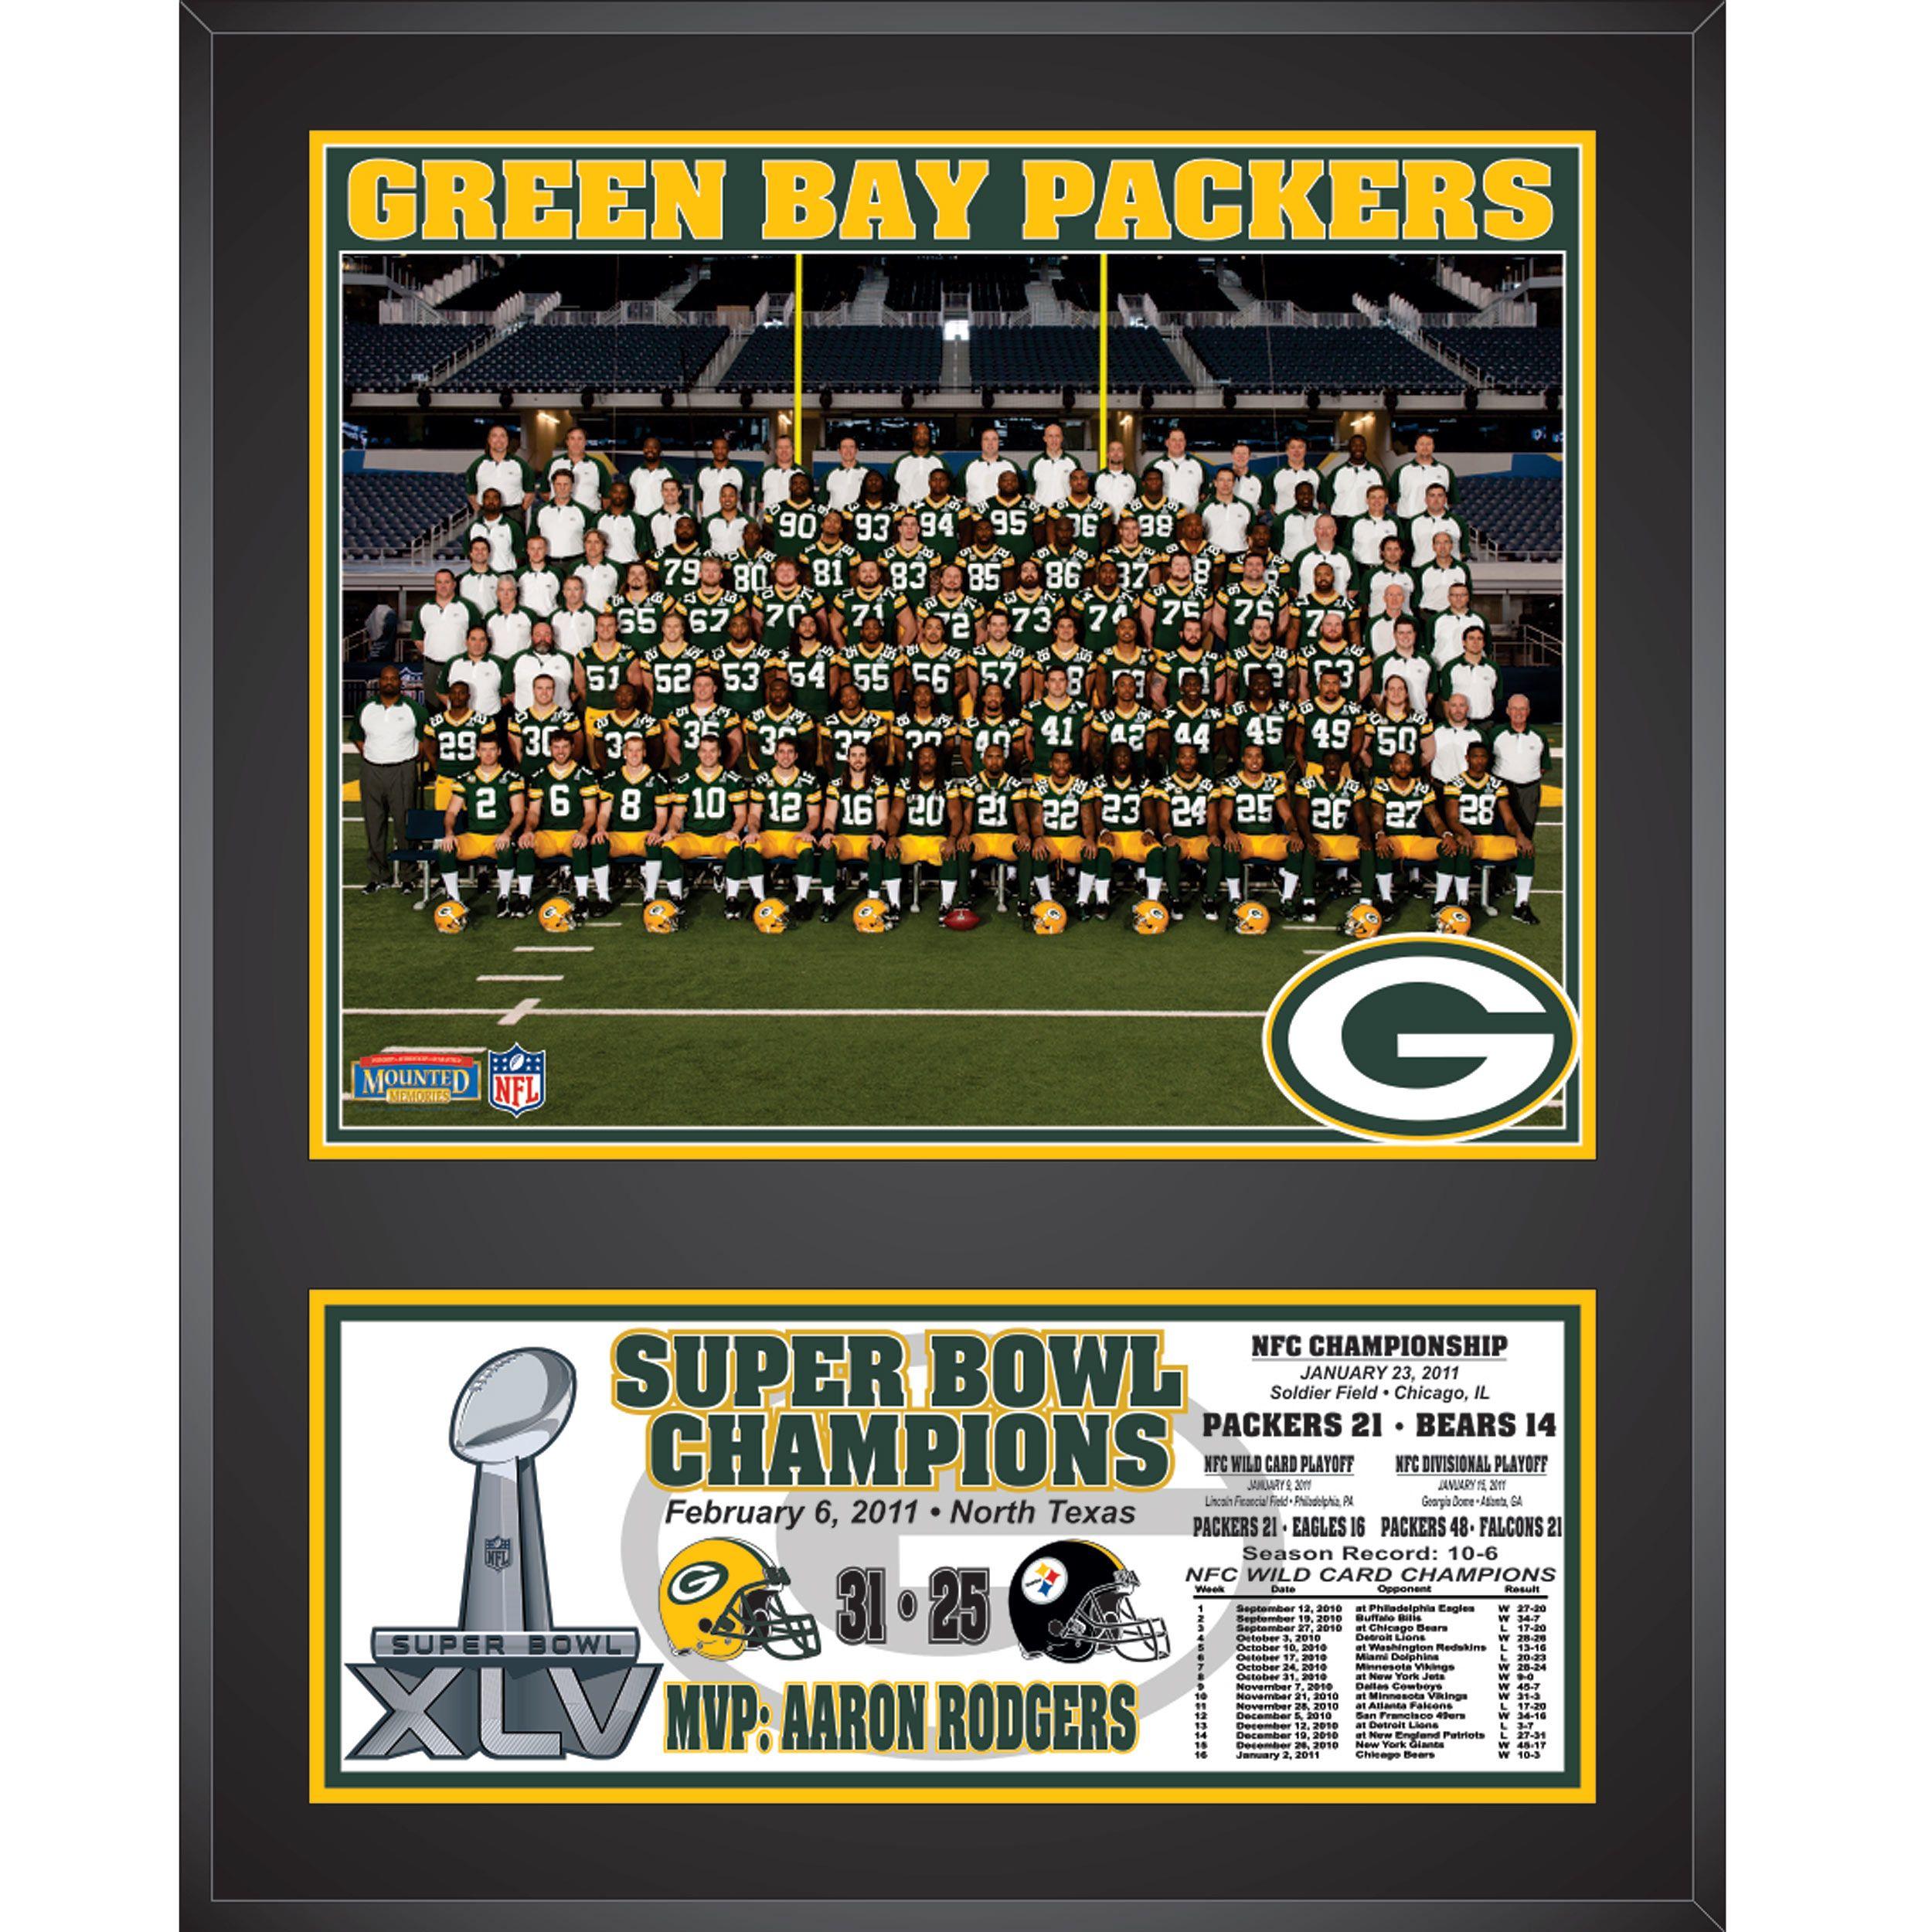 Super Bowl Xlv Team Photo Plaque At The Packers Pro Shop Superbowl Xlv Green Bay Green Bay Packers